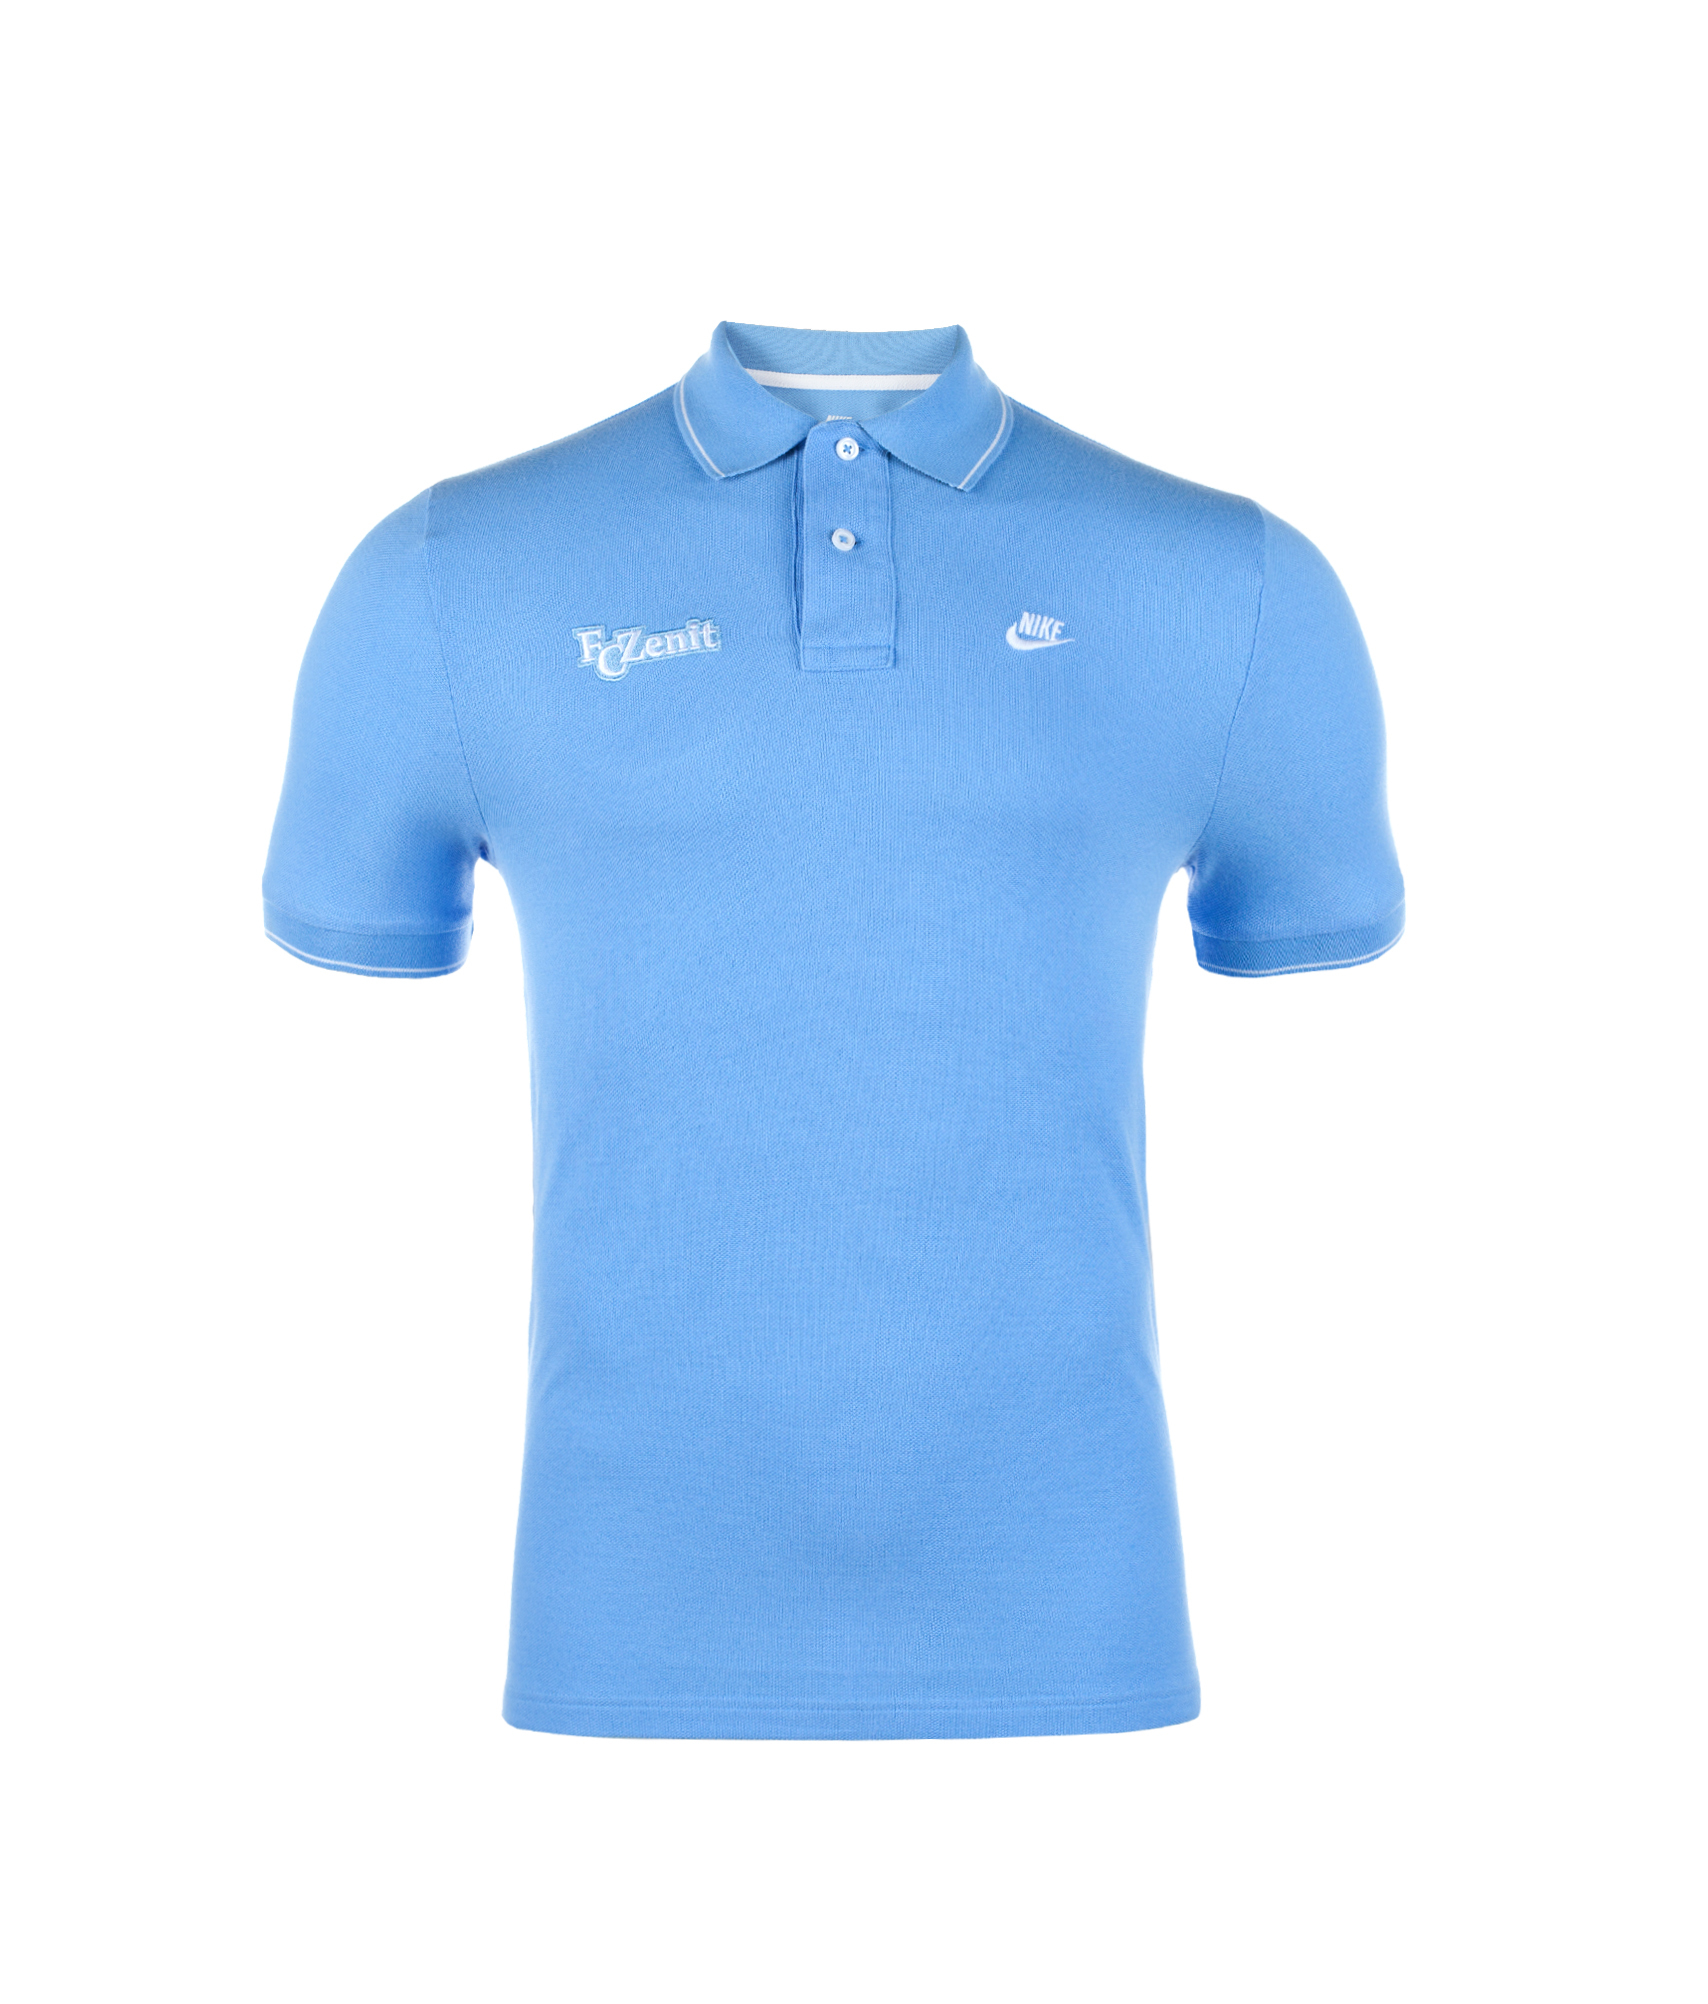 Поло Nike SUMMERIZED TIPPED GS POLO, Цвет-Голубой, Размер-XXL